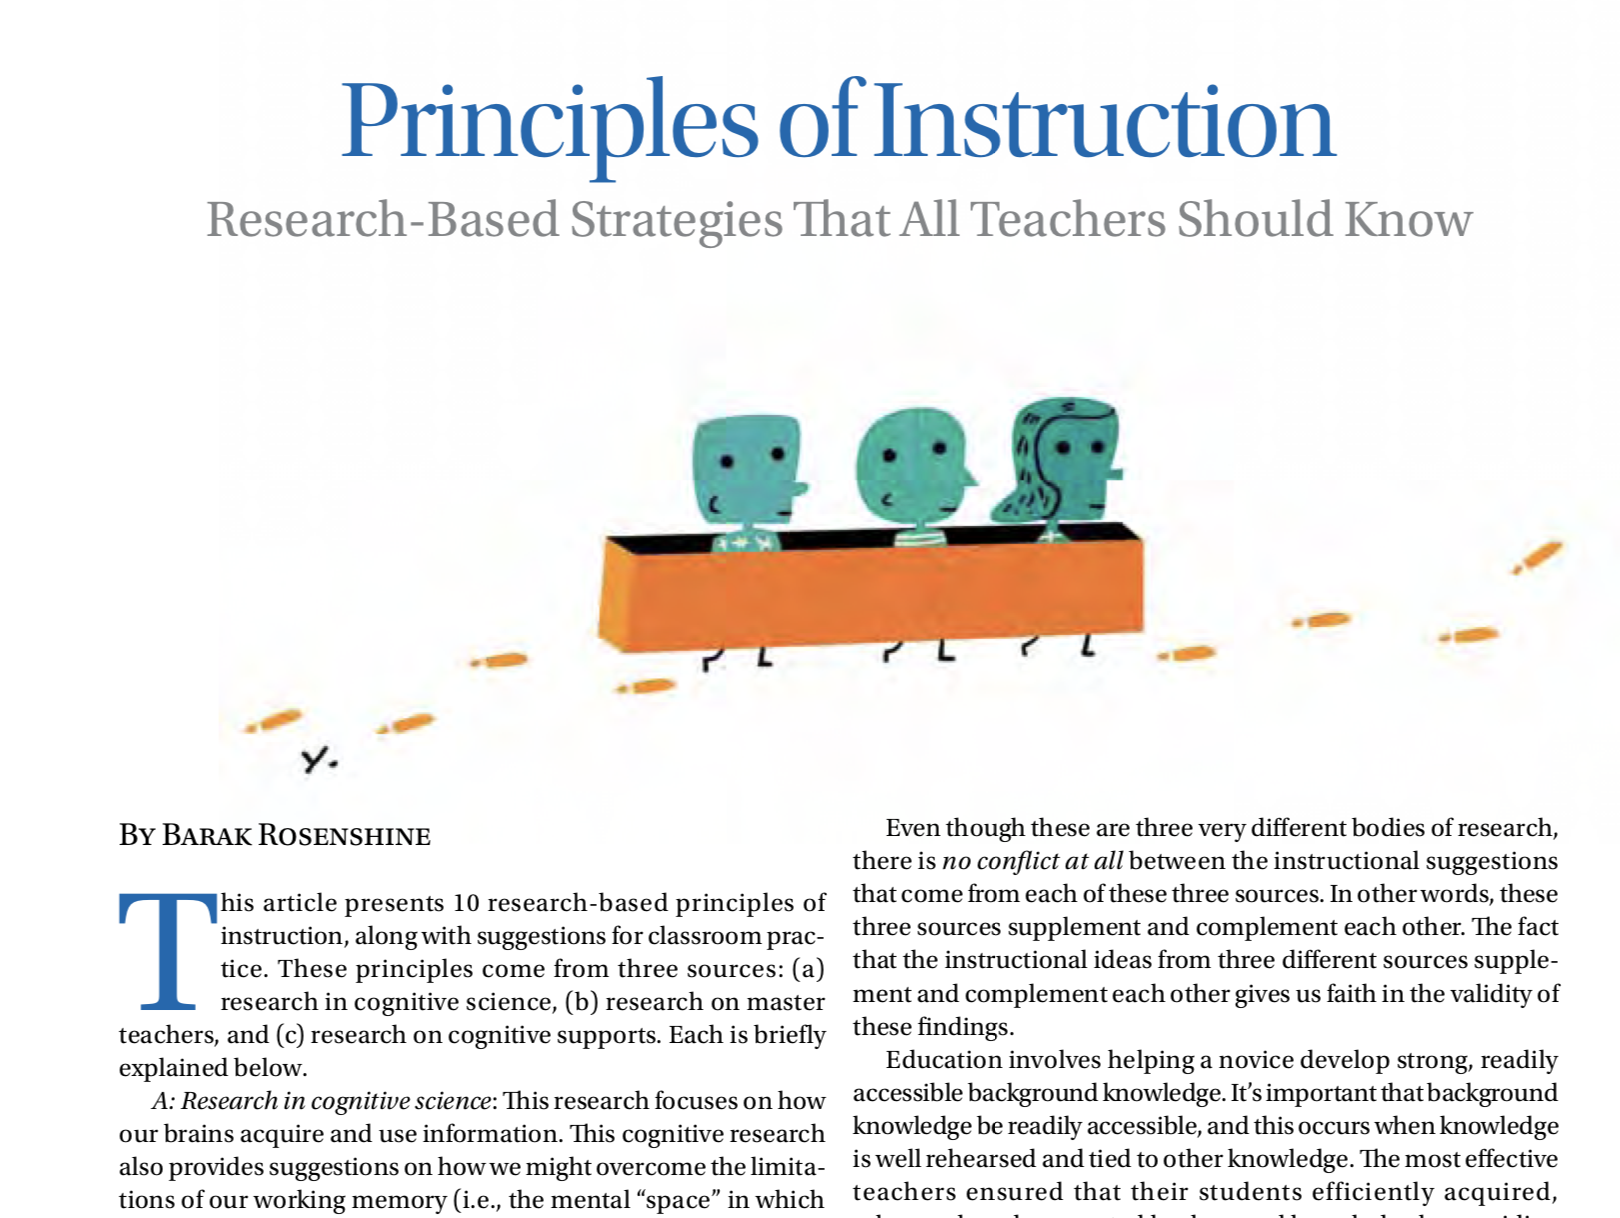 Exploring Barak Rosenshine's seminal Principles of Instruction: Why